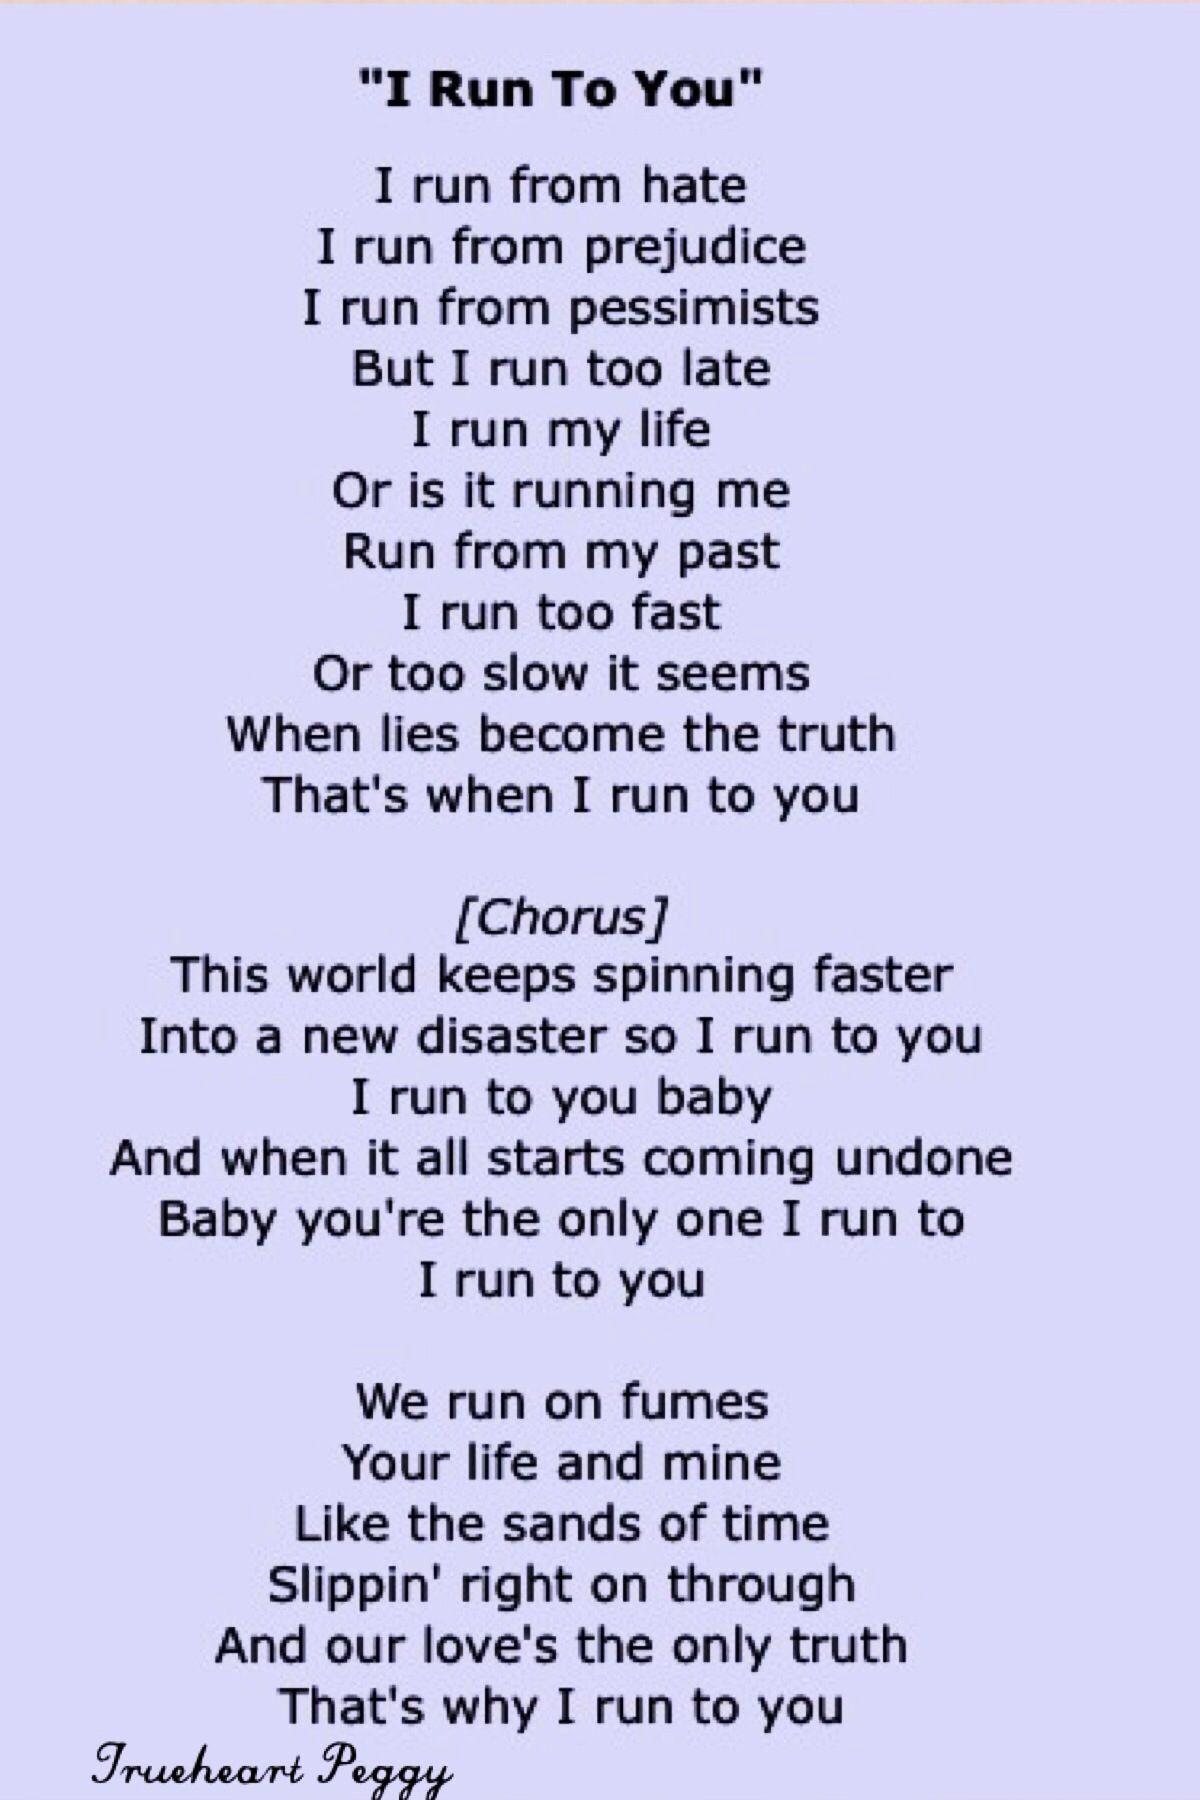 I run to you lyrics Lady Antebellum Rick and Kates source of